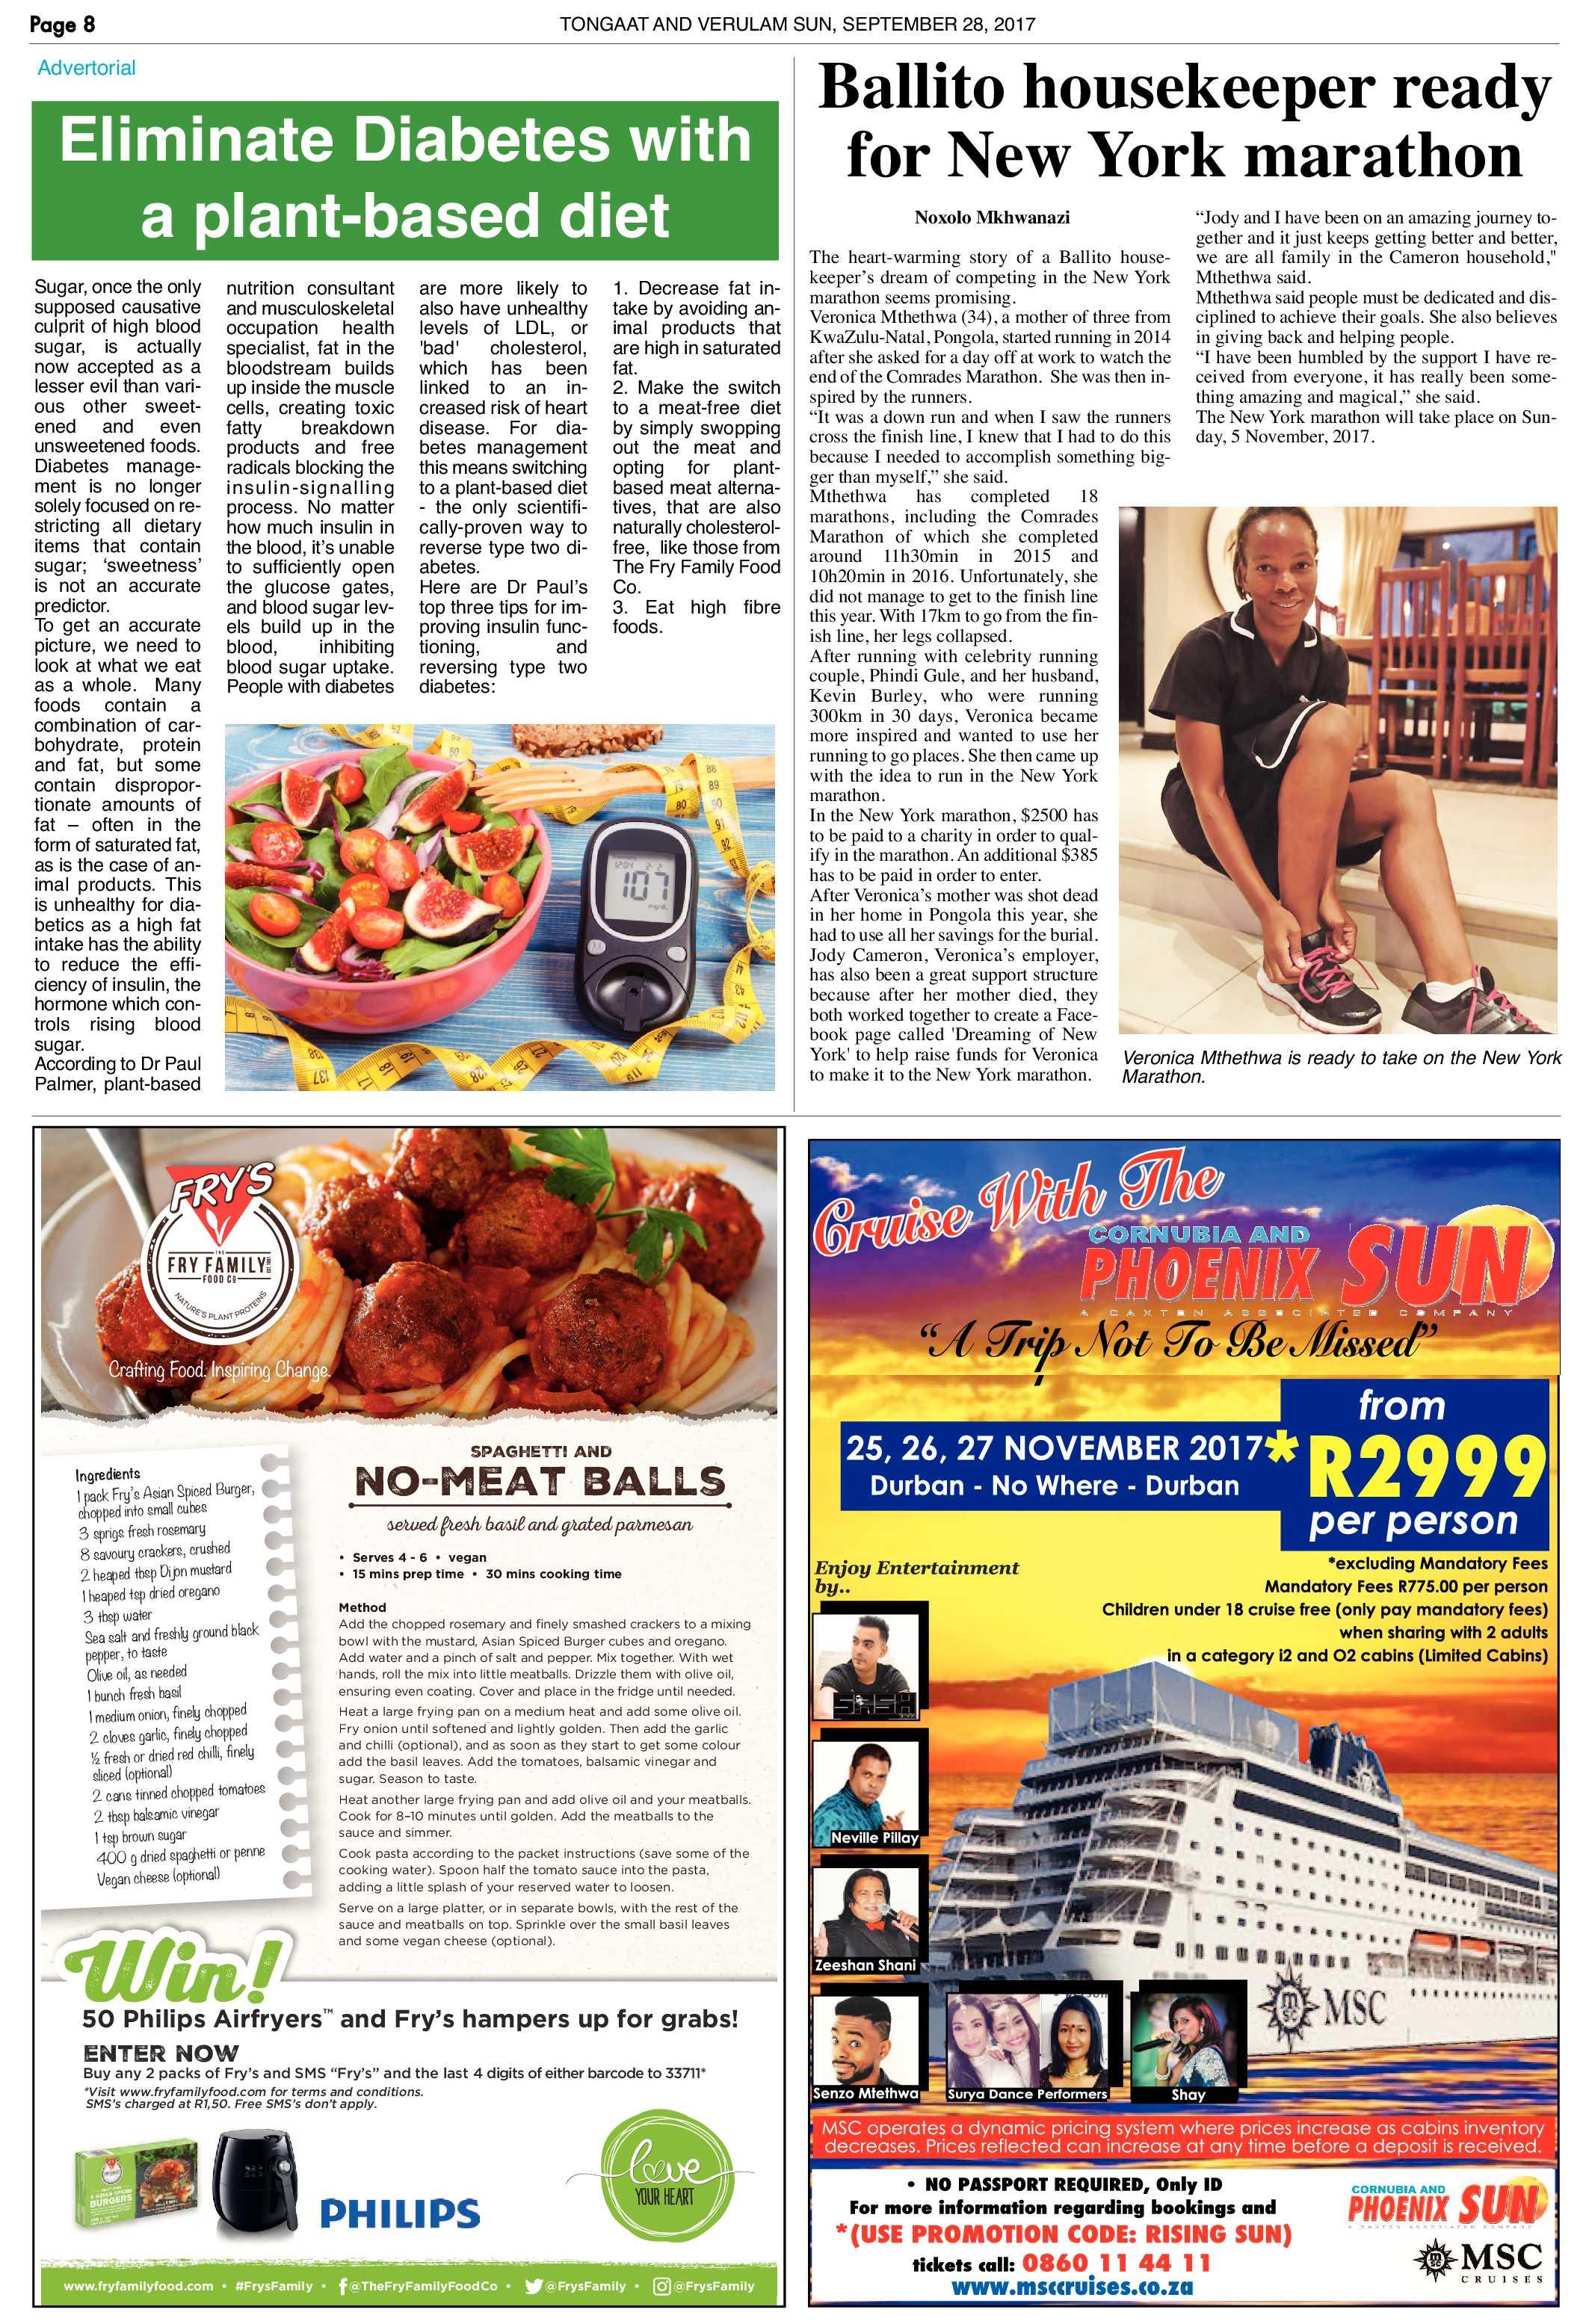 tongaat-verulam-sun-september-28-epapers-page-8